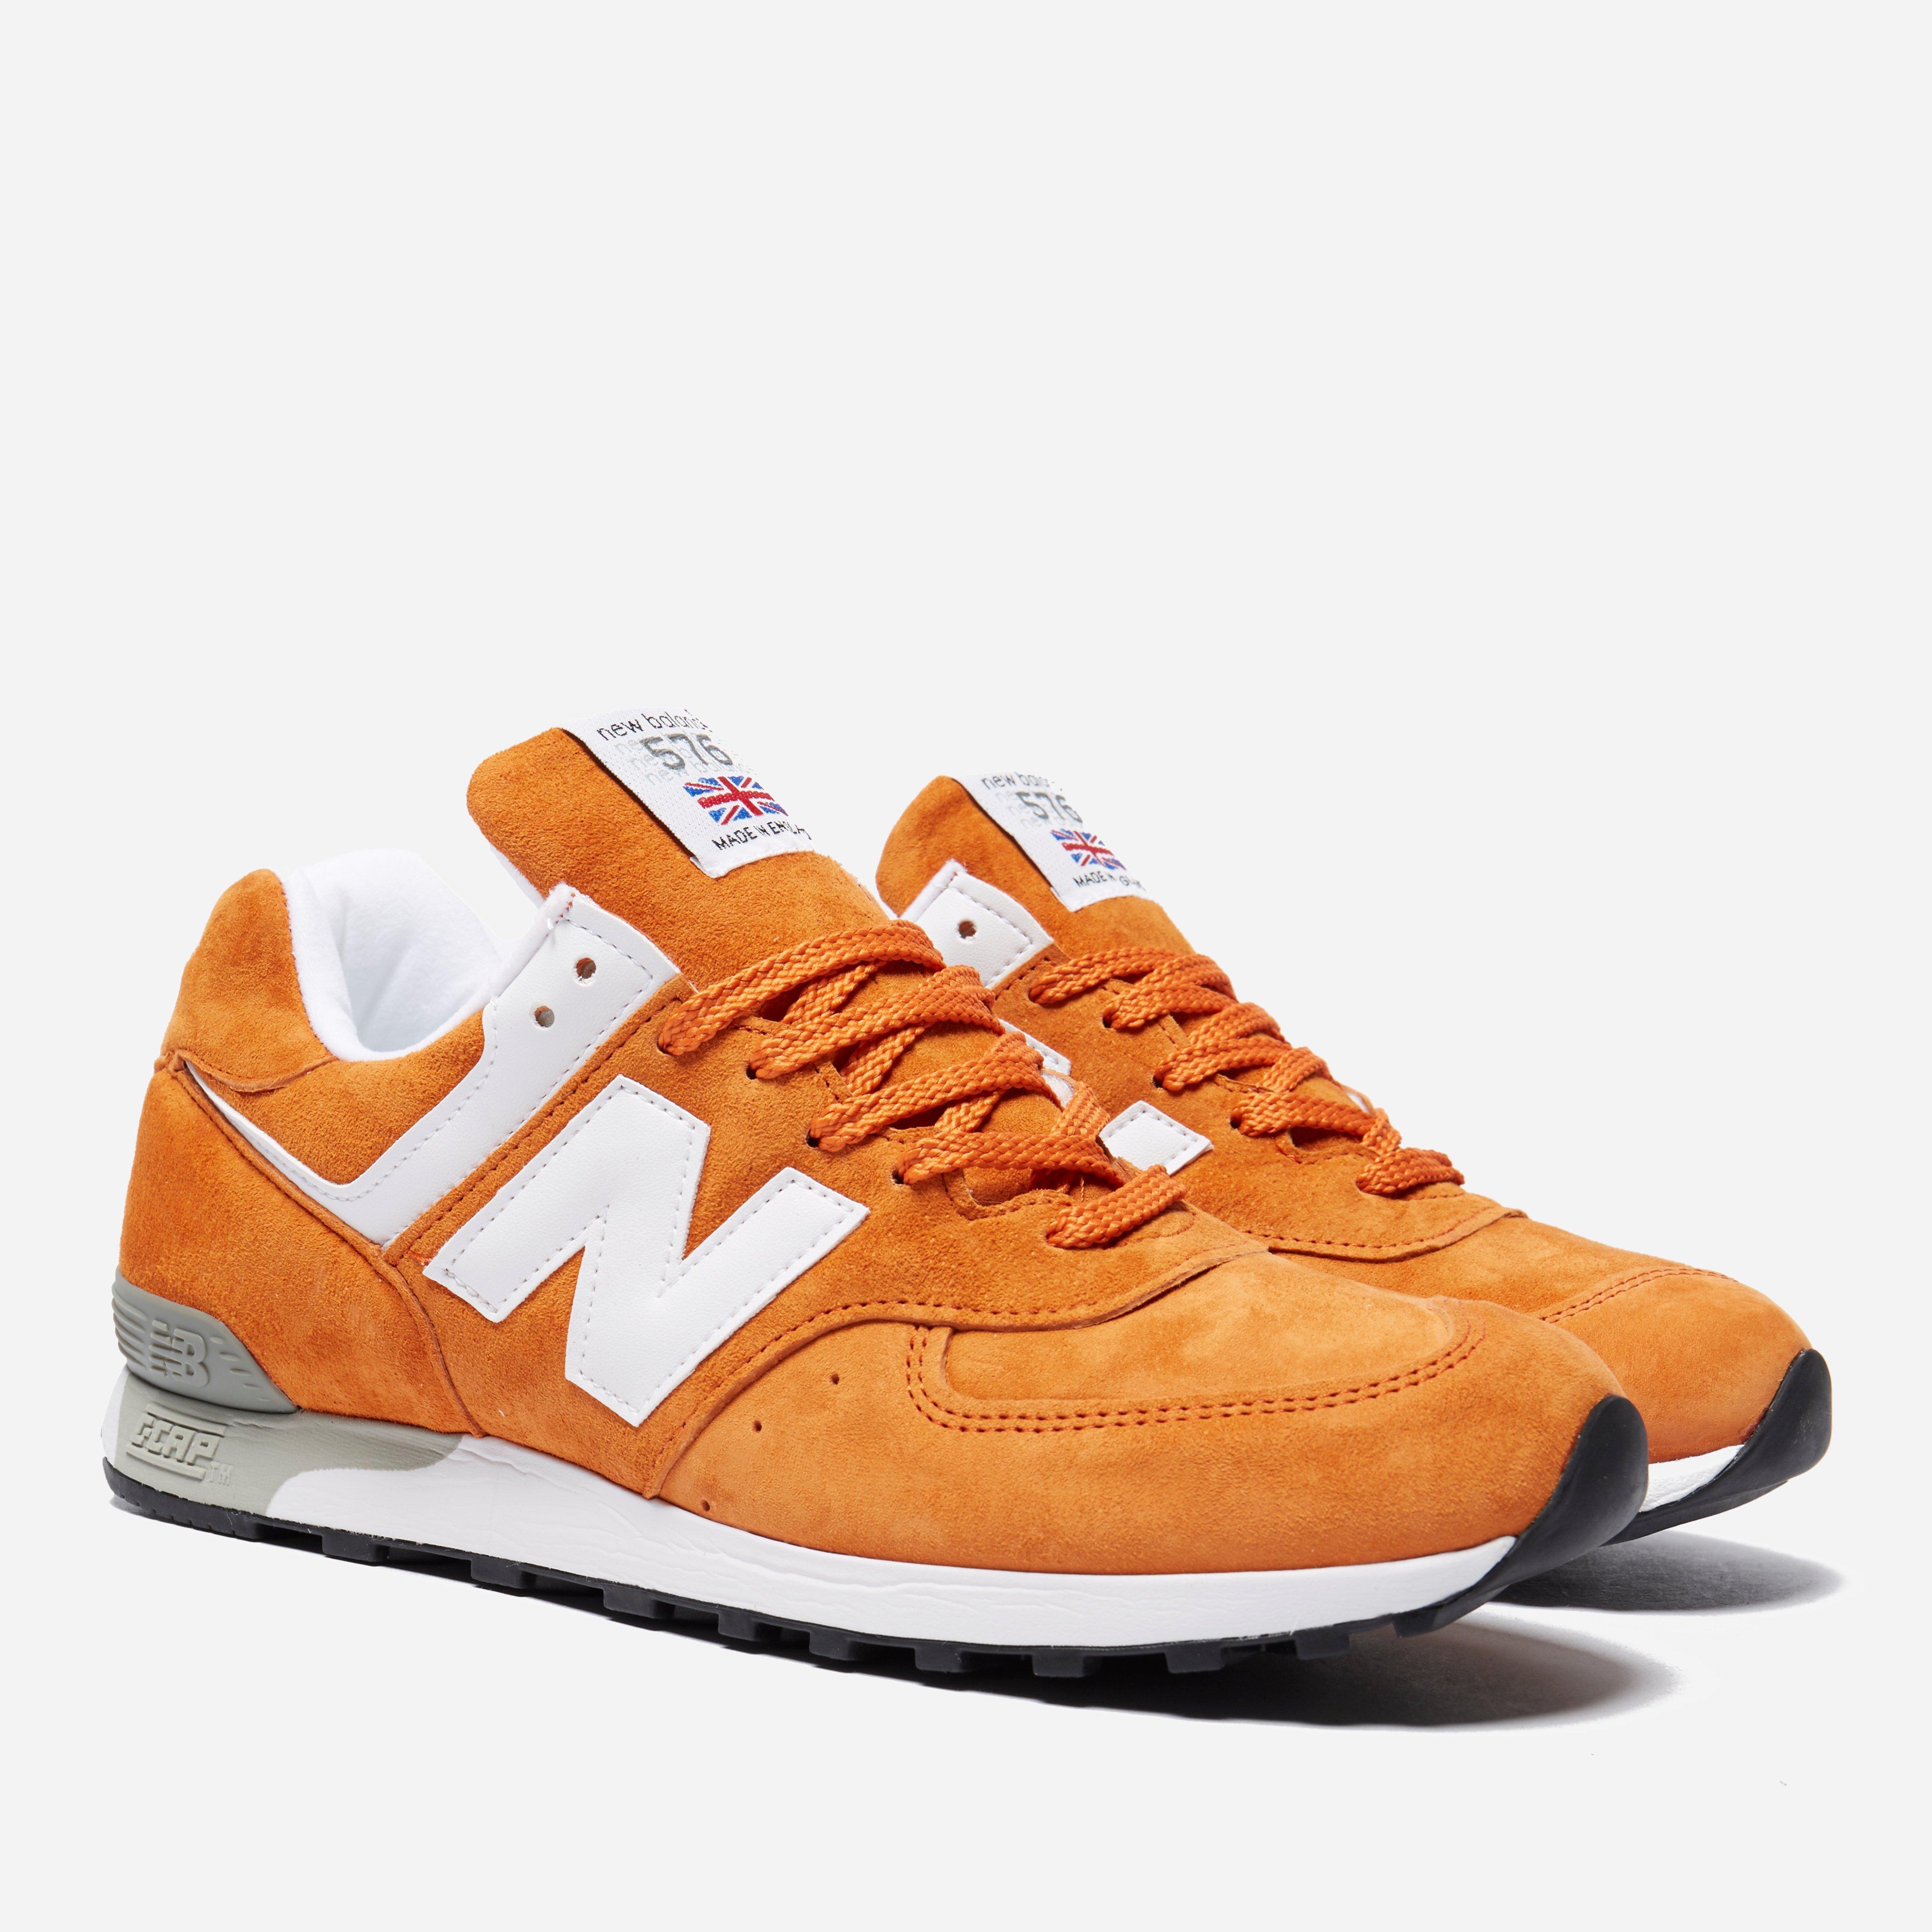 new balance 576 orange